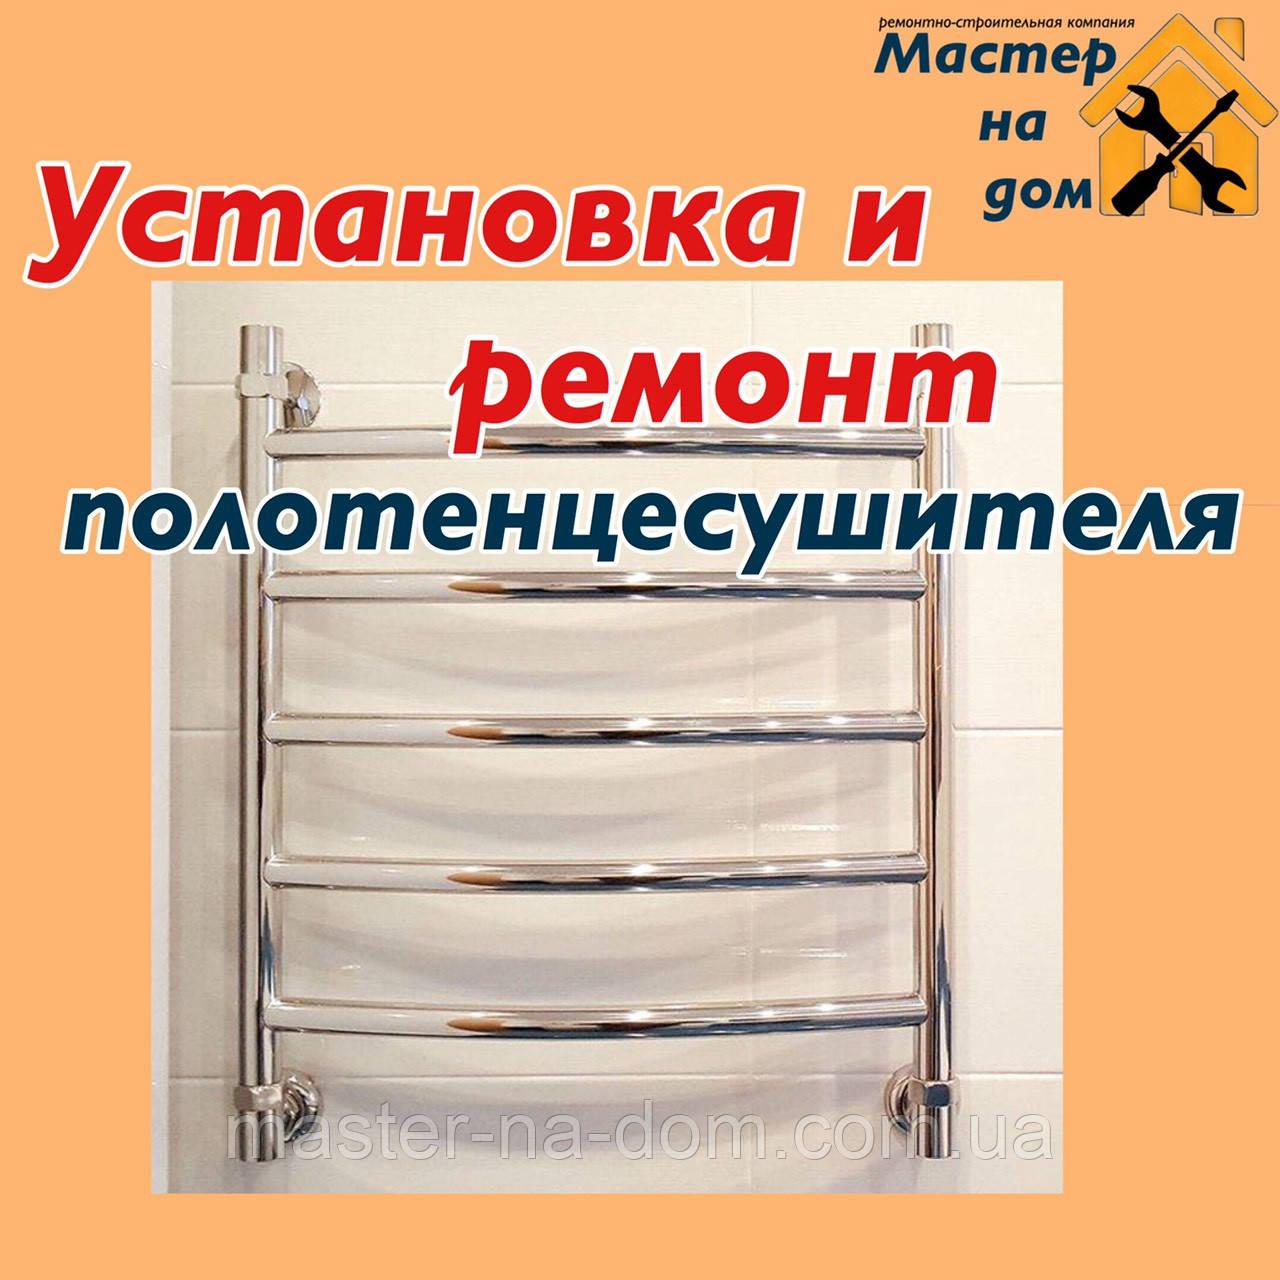 Установка и ремонт полотенцесушителя в Днепре